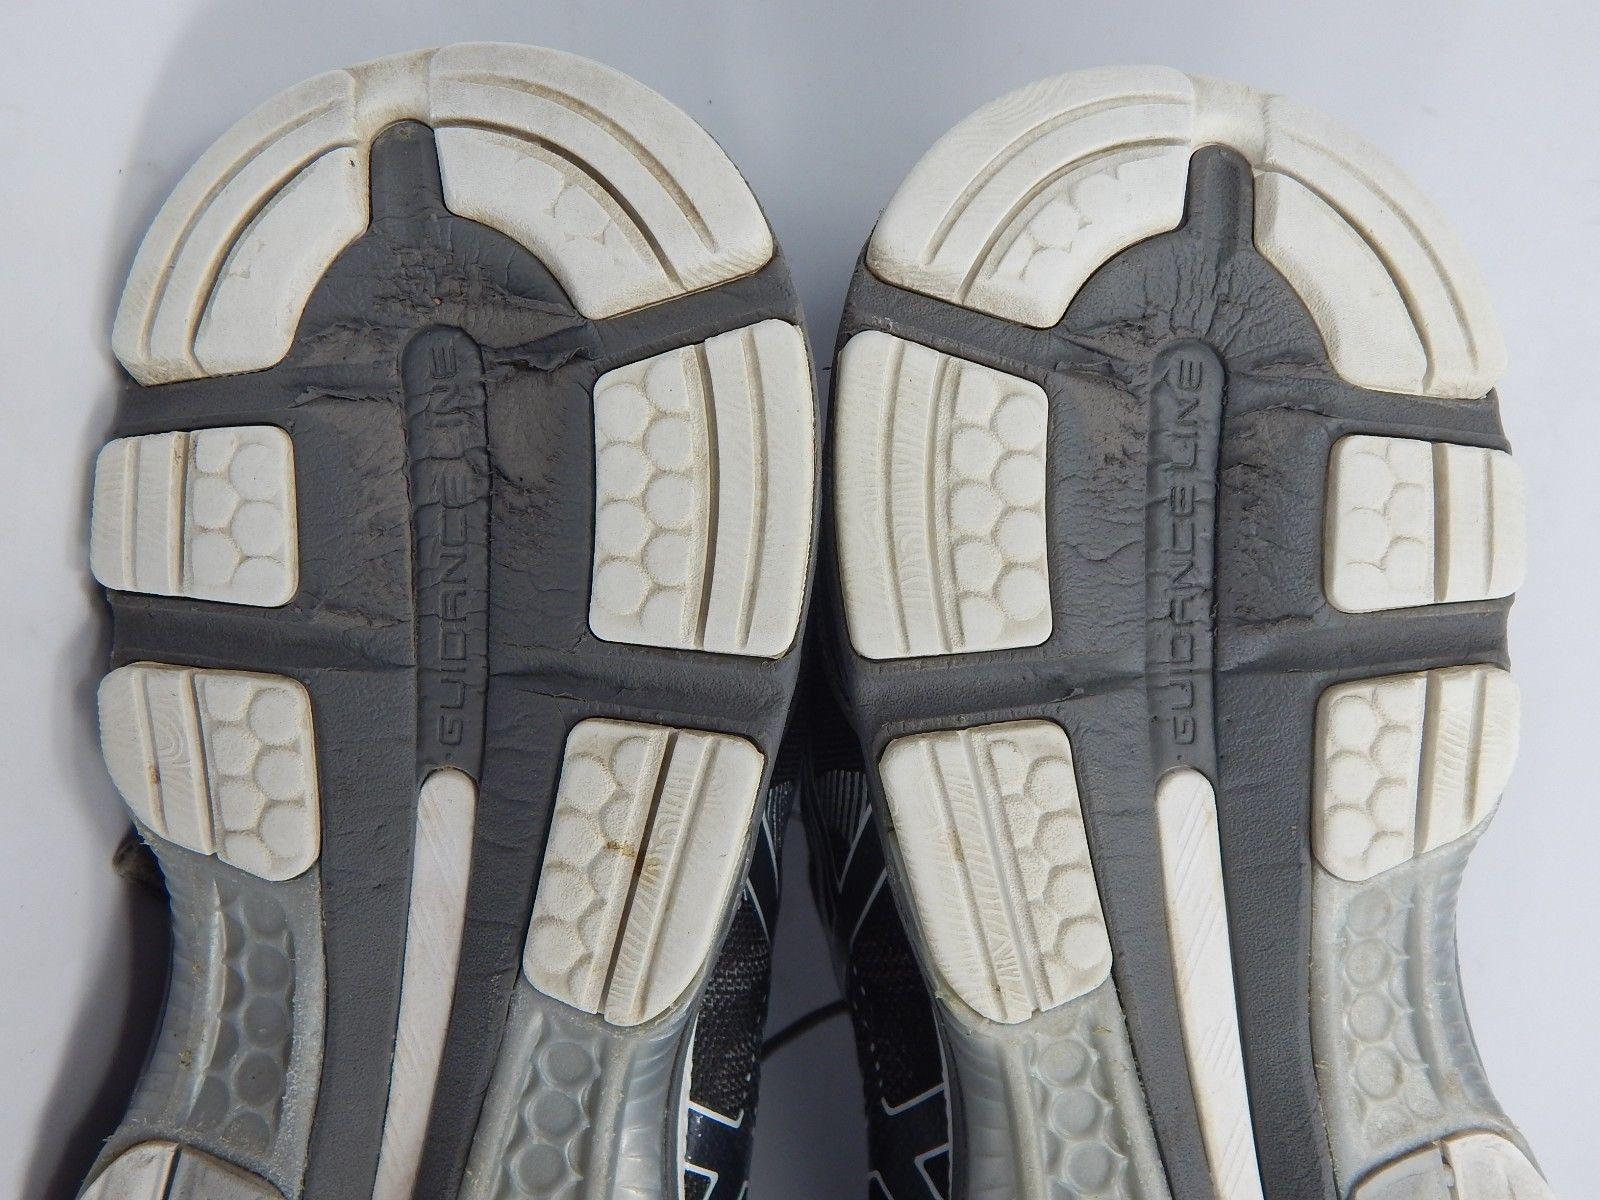 Asics Gel Nimbus 19 Sz: US 14 M (D) EU 49 Men's Running Shoes Silver Gray T700N